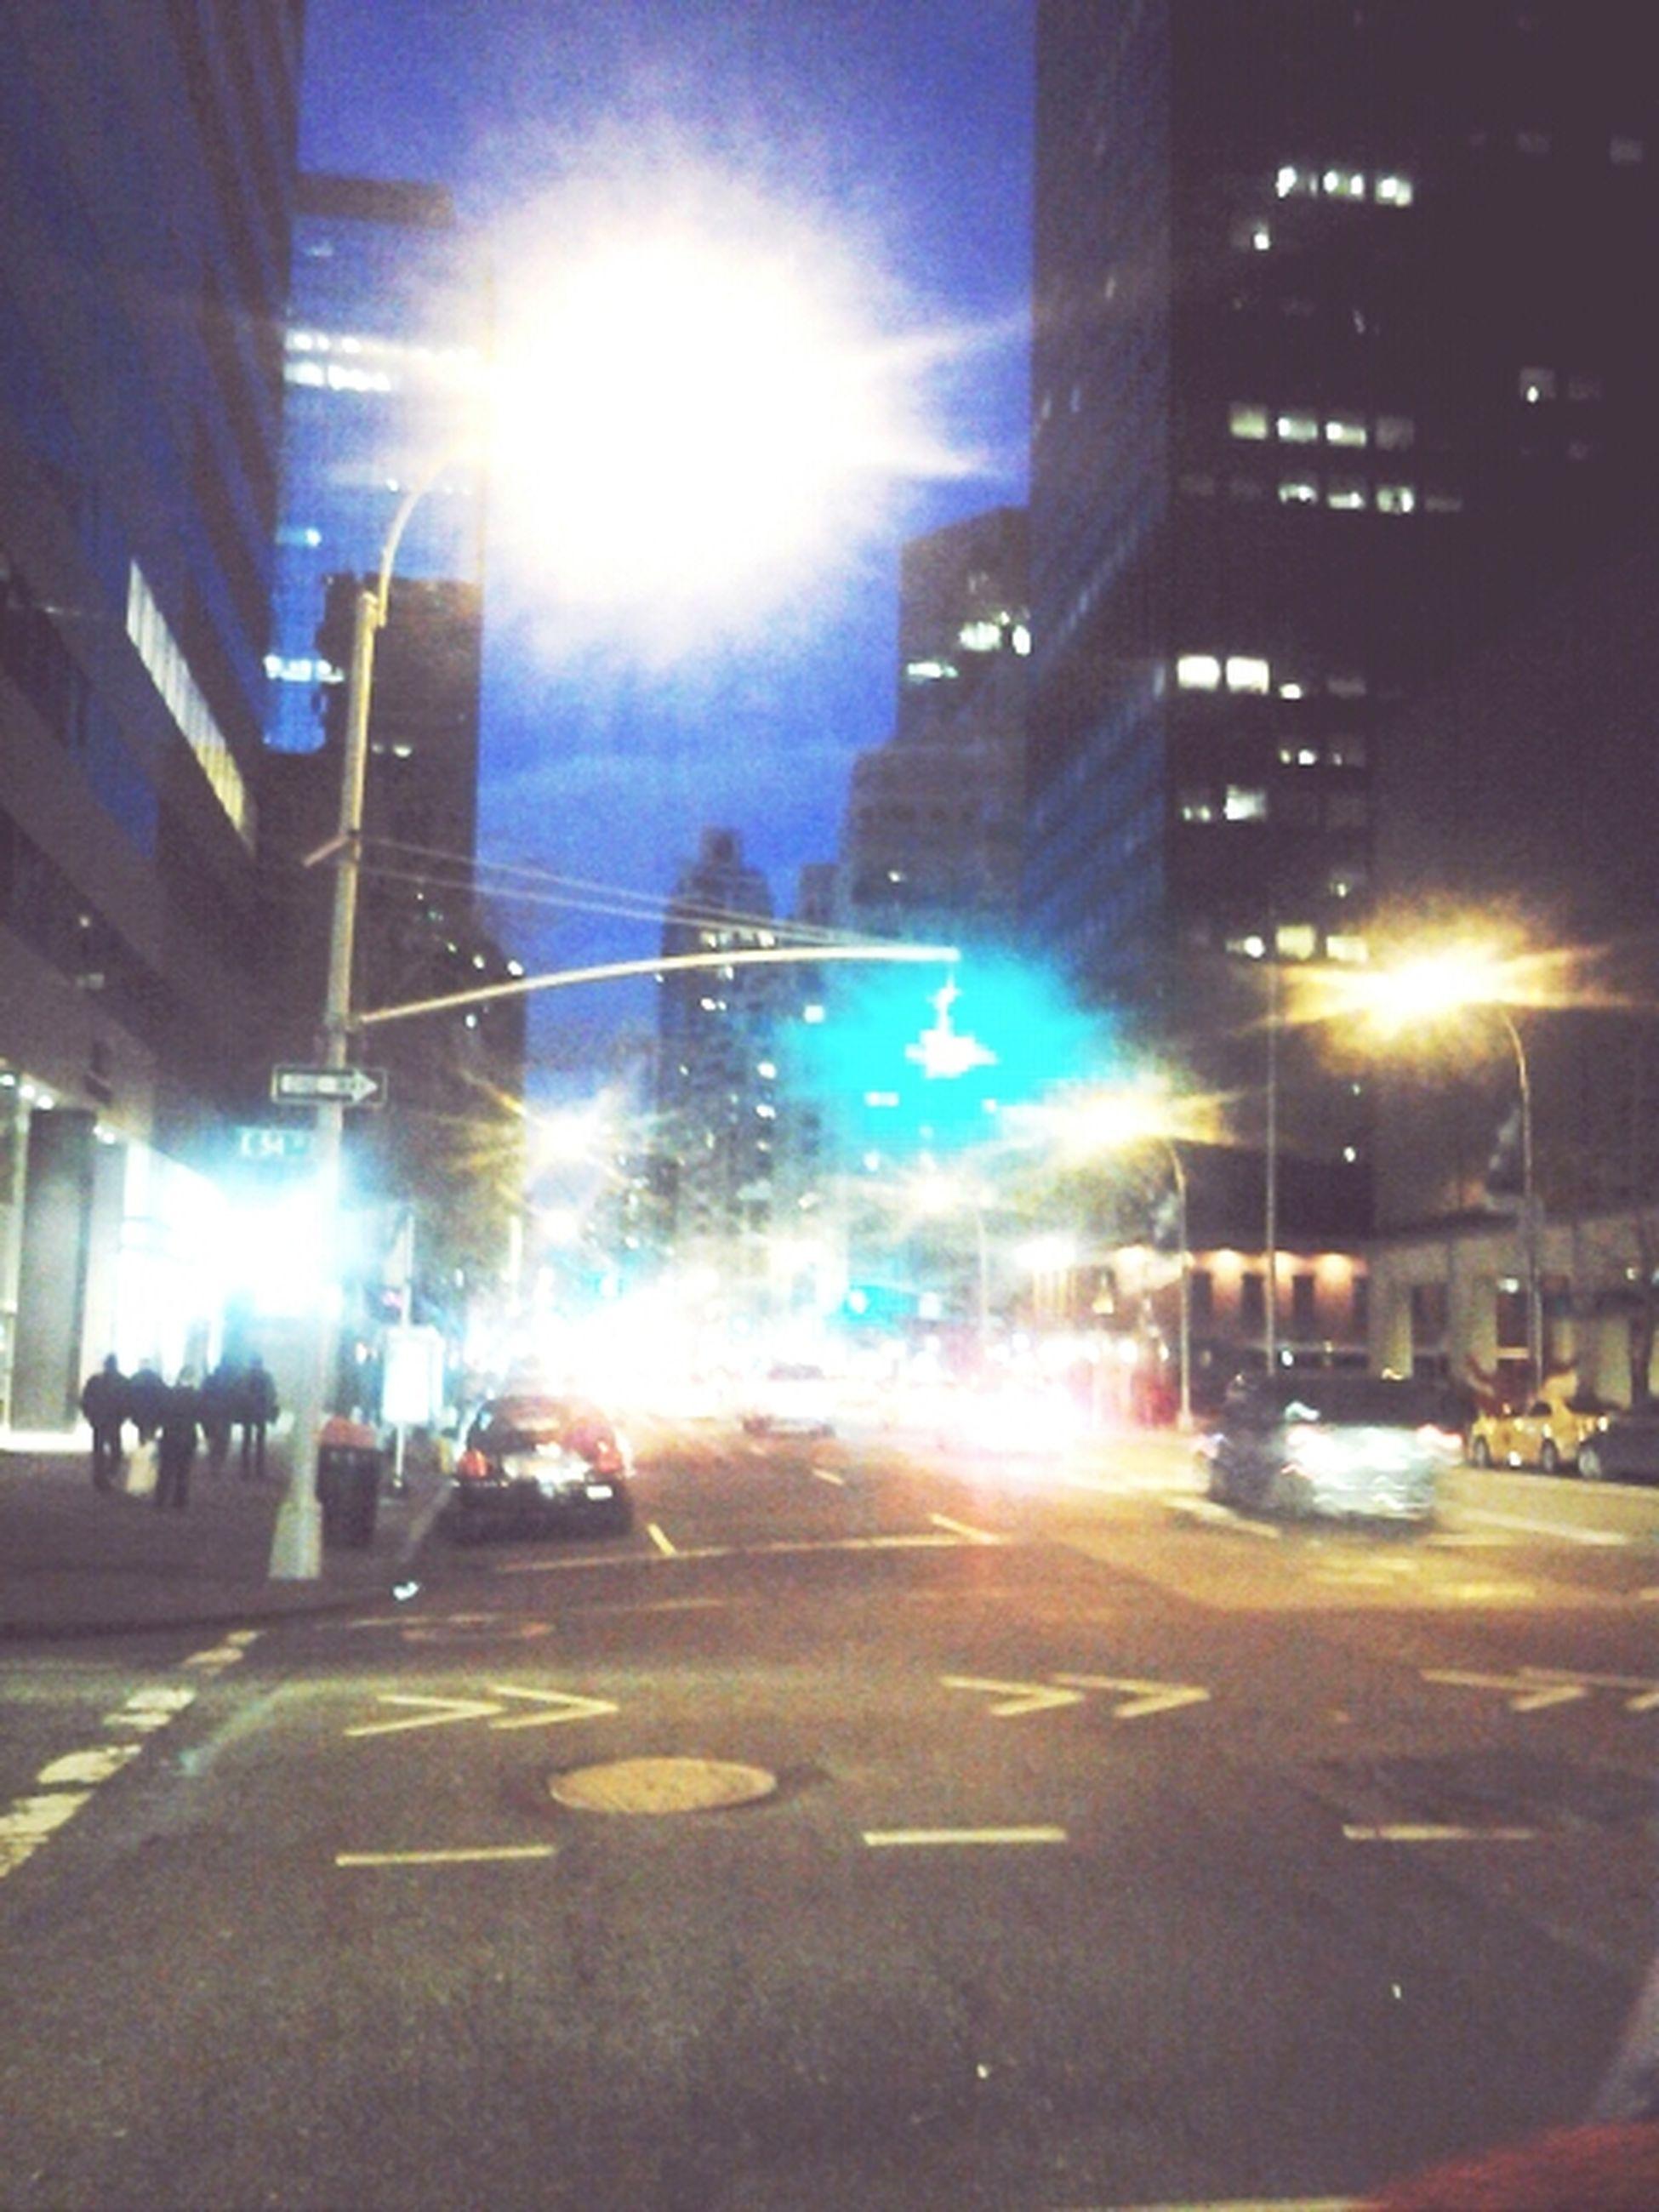 city, transportation, building exterior, street, architecture, car, built structure, city street, illuminated, land vehicle, road, city life, street light, mode of transport, road marking, night, traffic, road signal, lens flare, zebra crossing